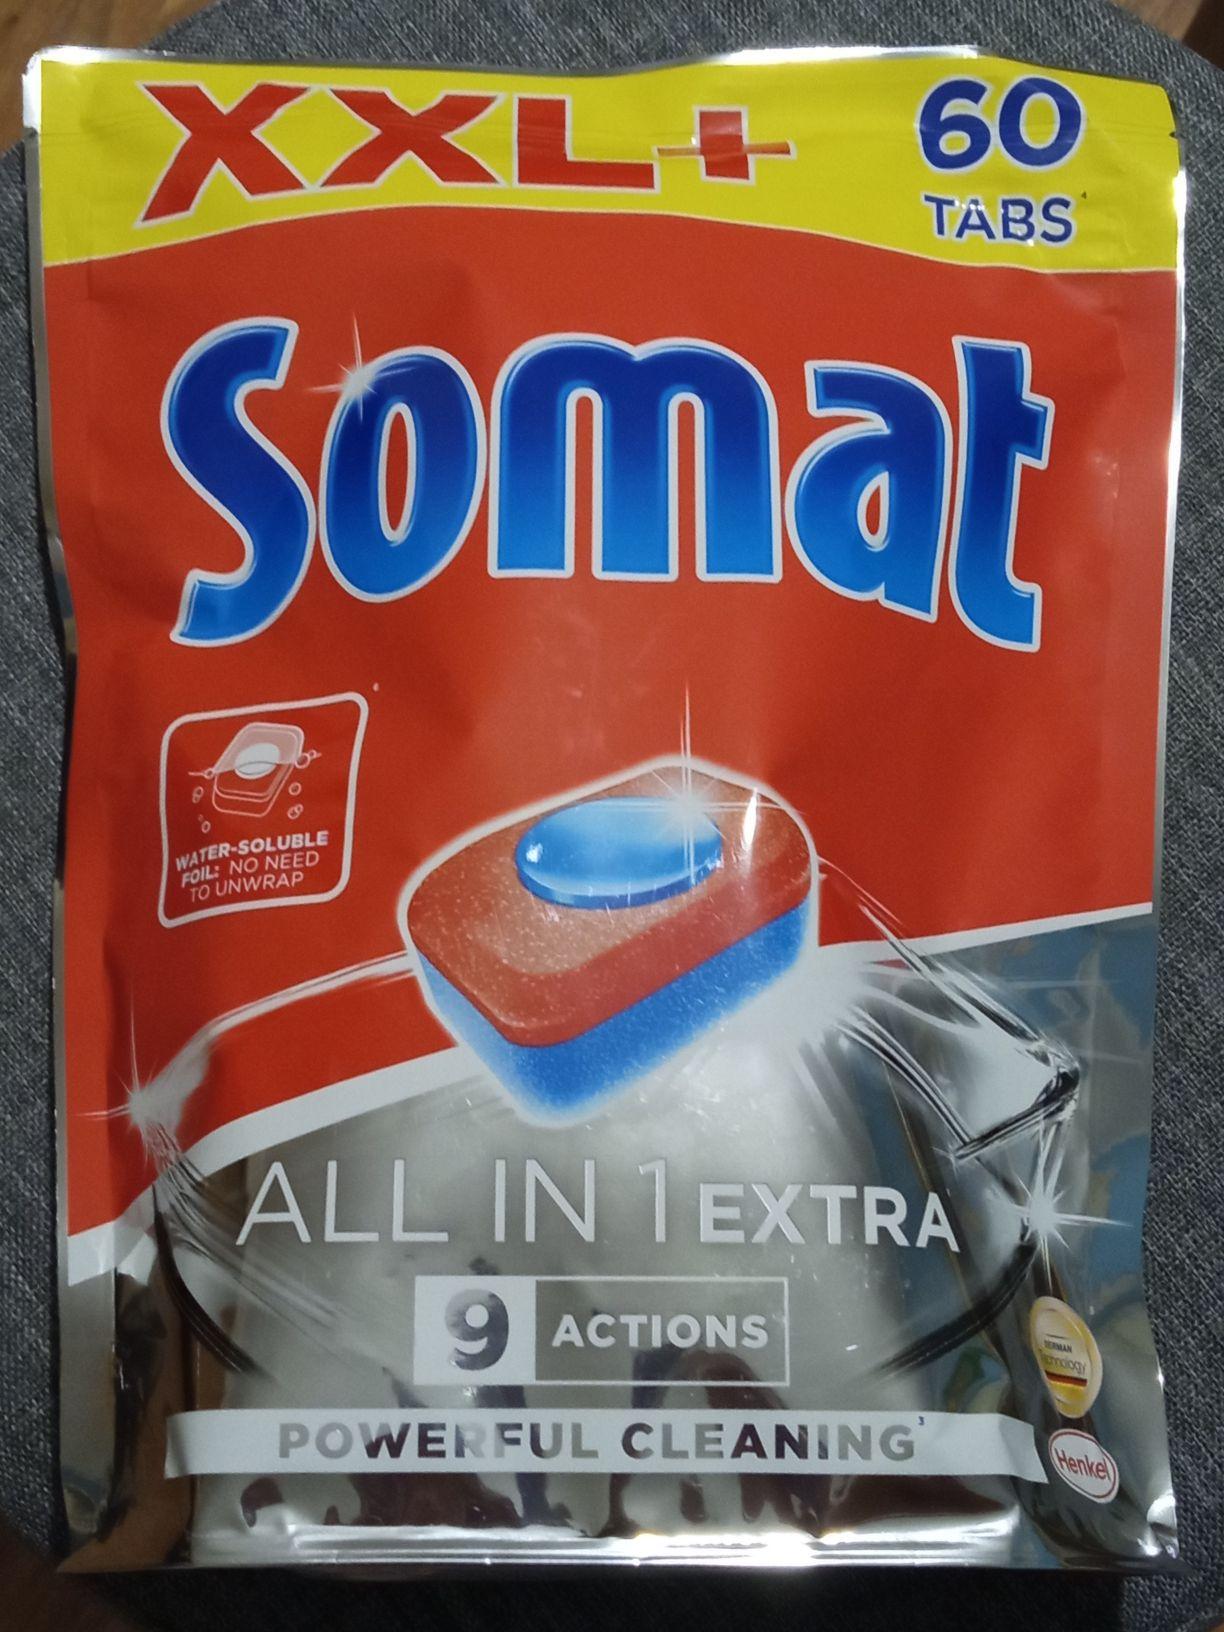 Somat All in 1 EXTRA (0,31 zł/szt.) @Lidl